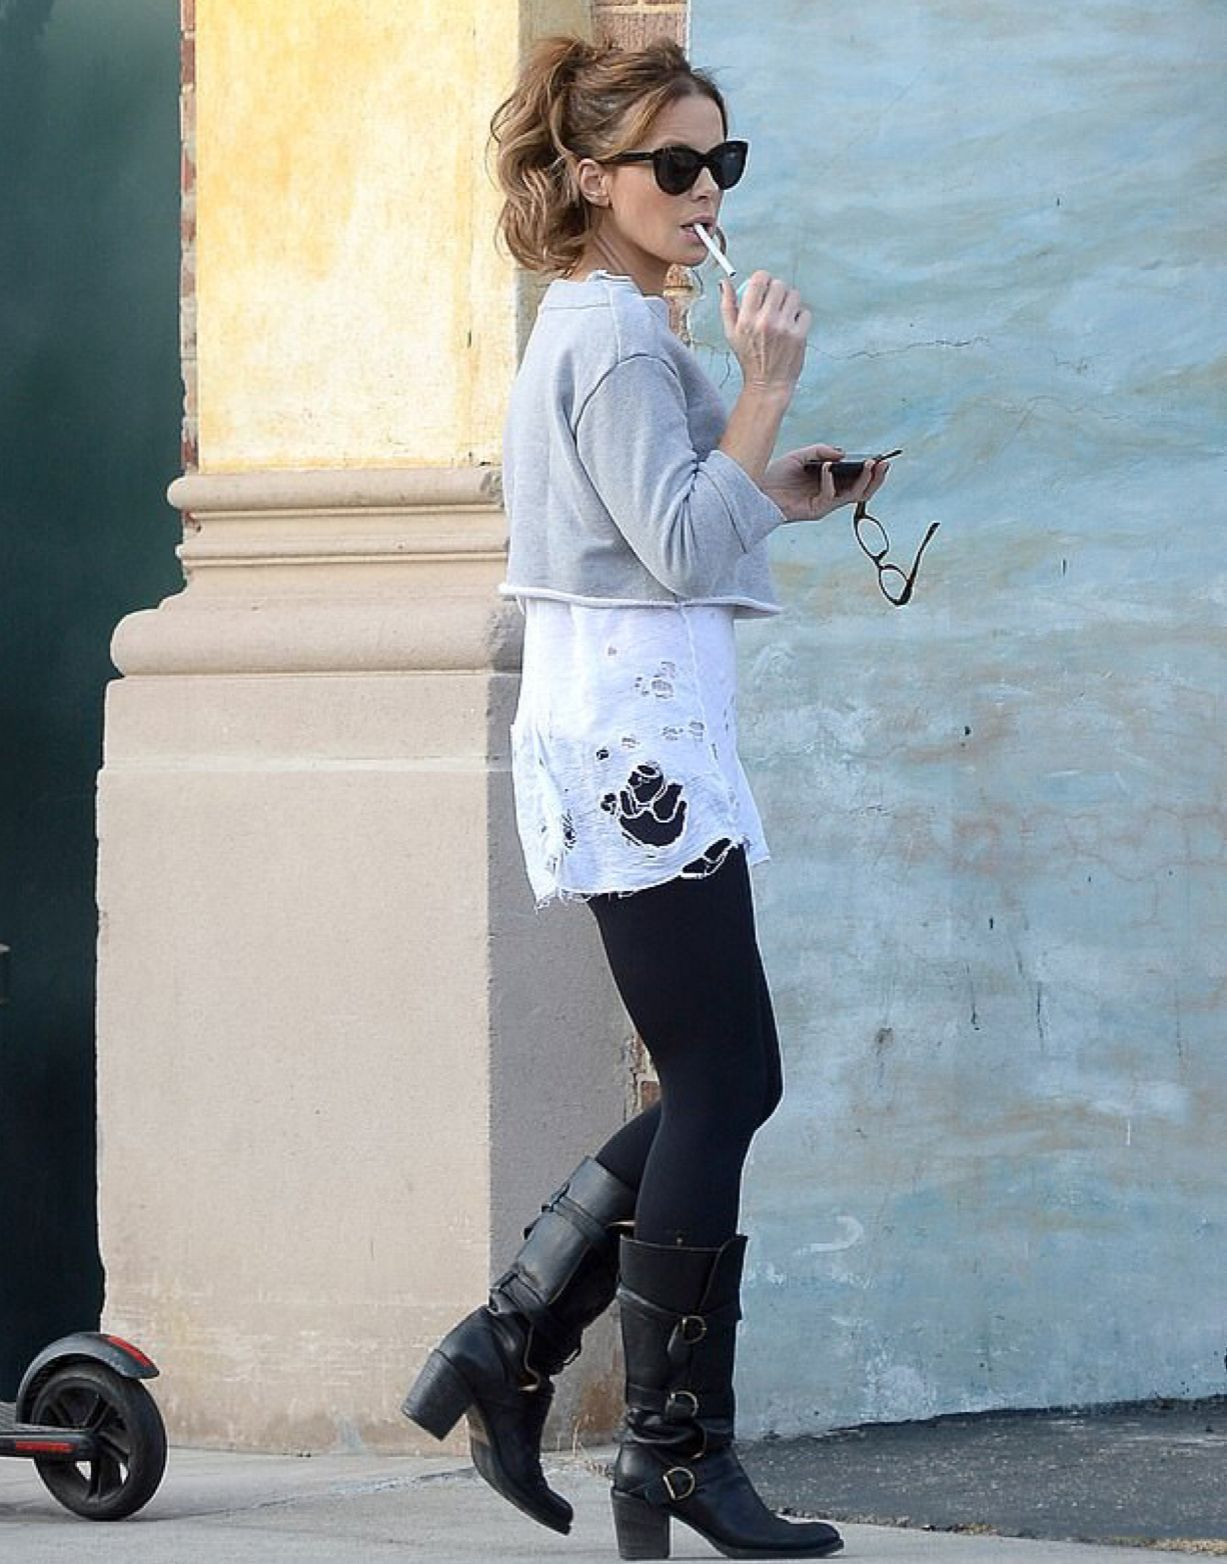 71720c0c70e130 Kate Beckinsale s nicotine addiction appears steady (10-2018 ...